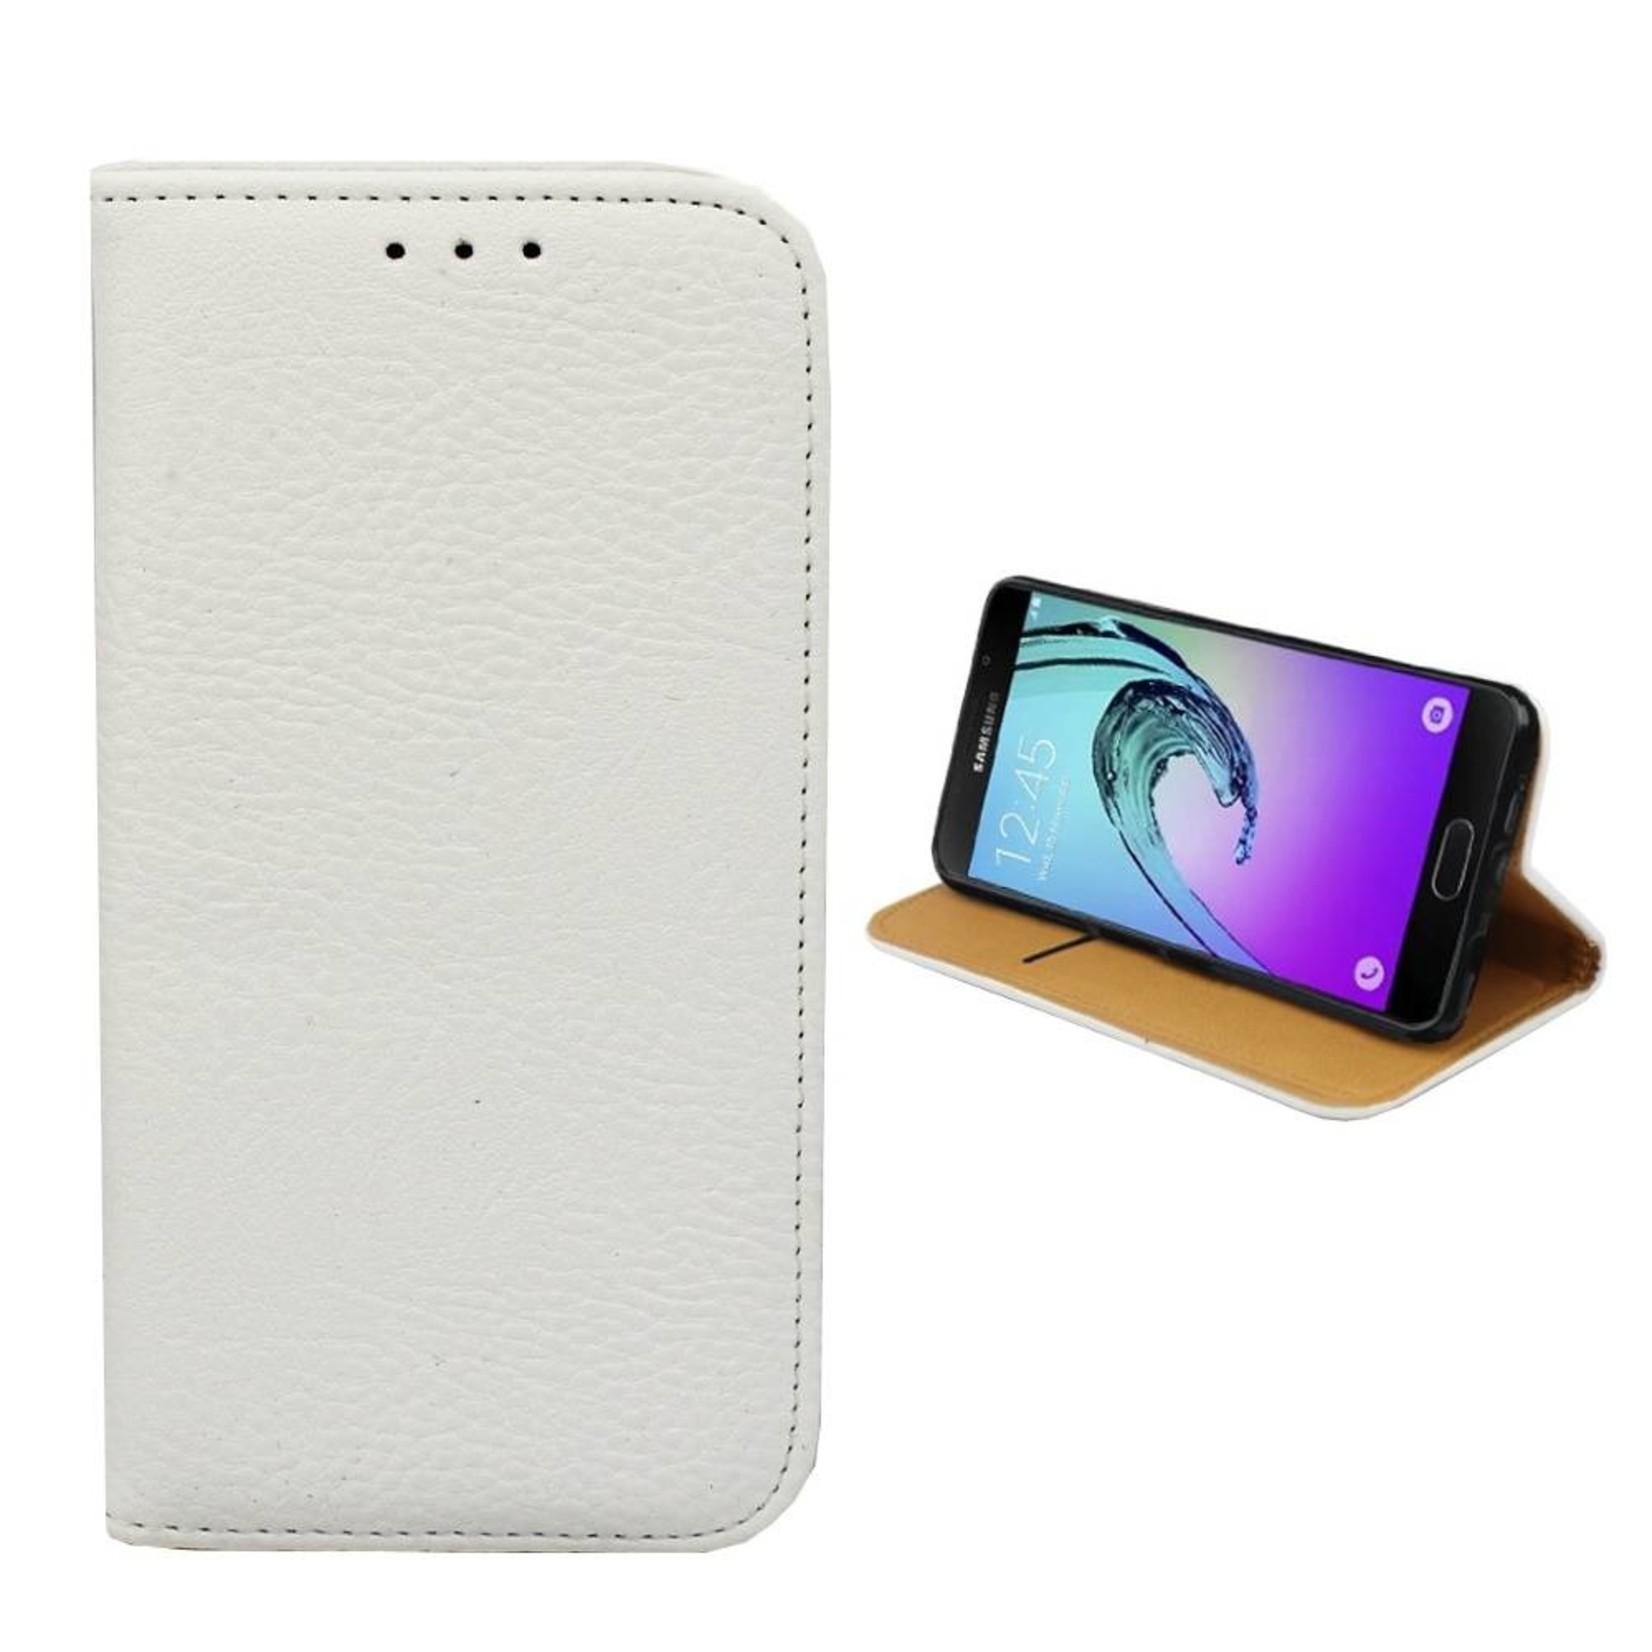 Colorfone Hoesje Book voor Samsung A5 2016 Wit